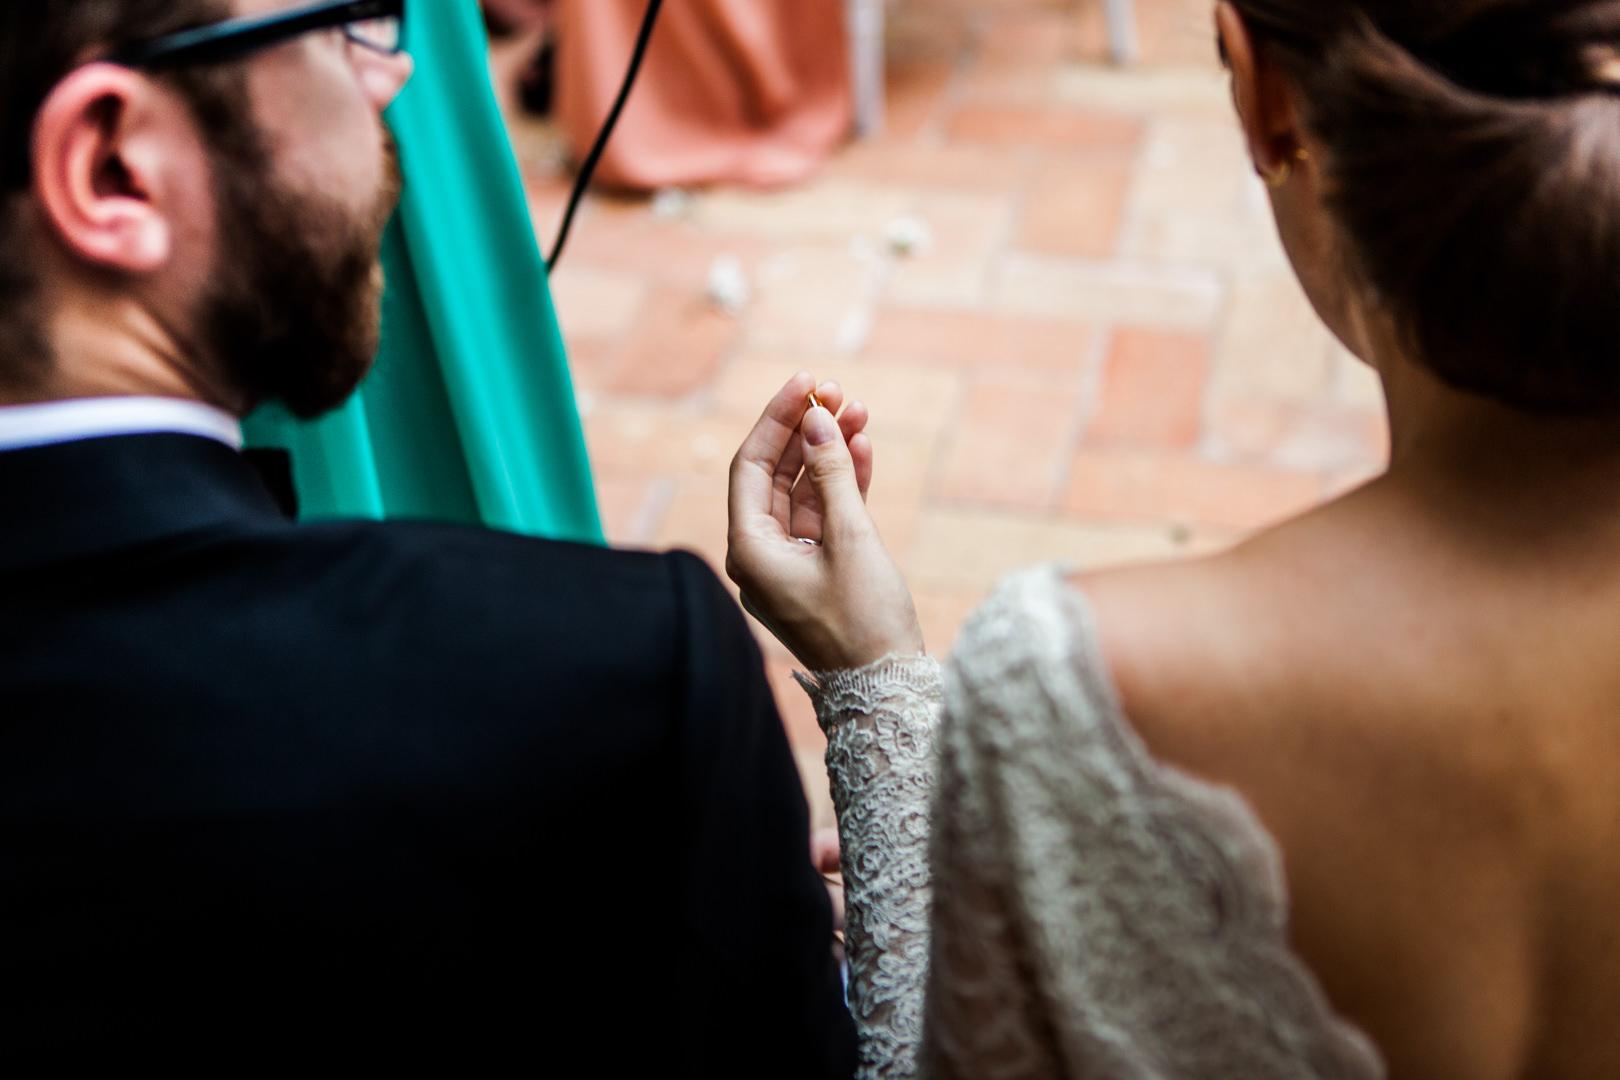 Boda-Sevilla-Museo-Carmona-Hamburgo-Maria-Carles-engagement-Rafael-Torres-fotografo-bodas-sevilla-madrid-barcelona-wedding-photographer--23.jpg